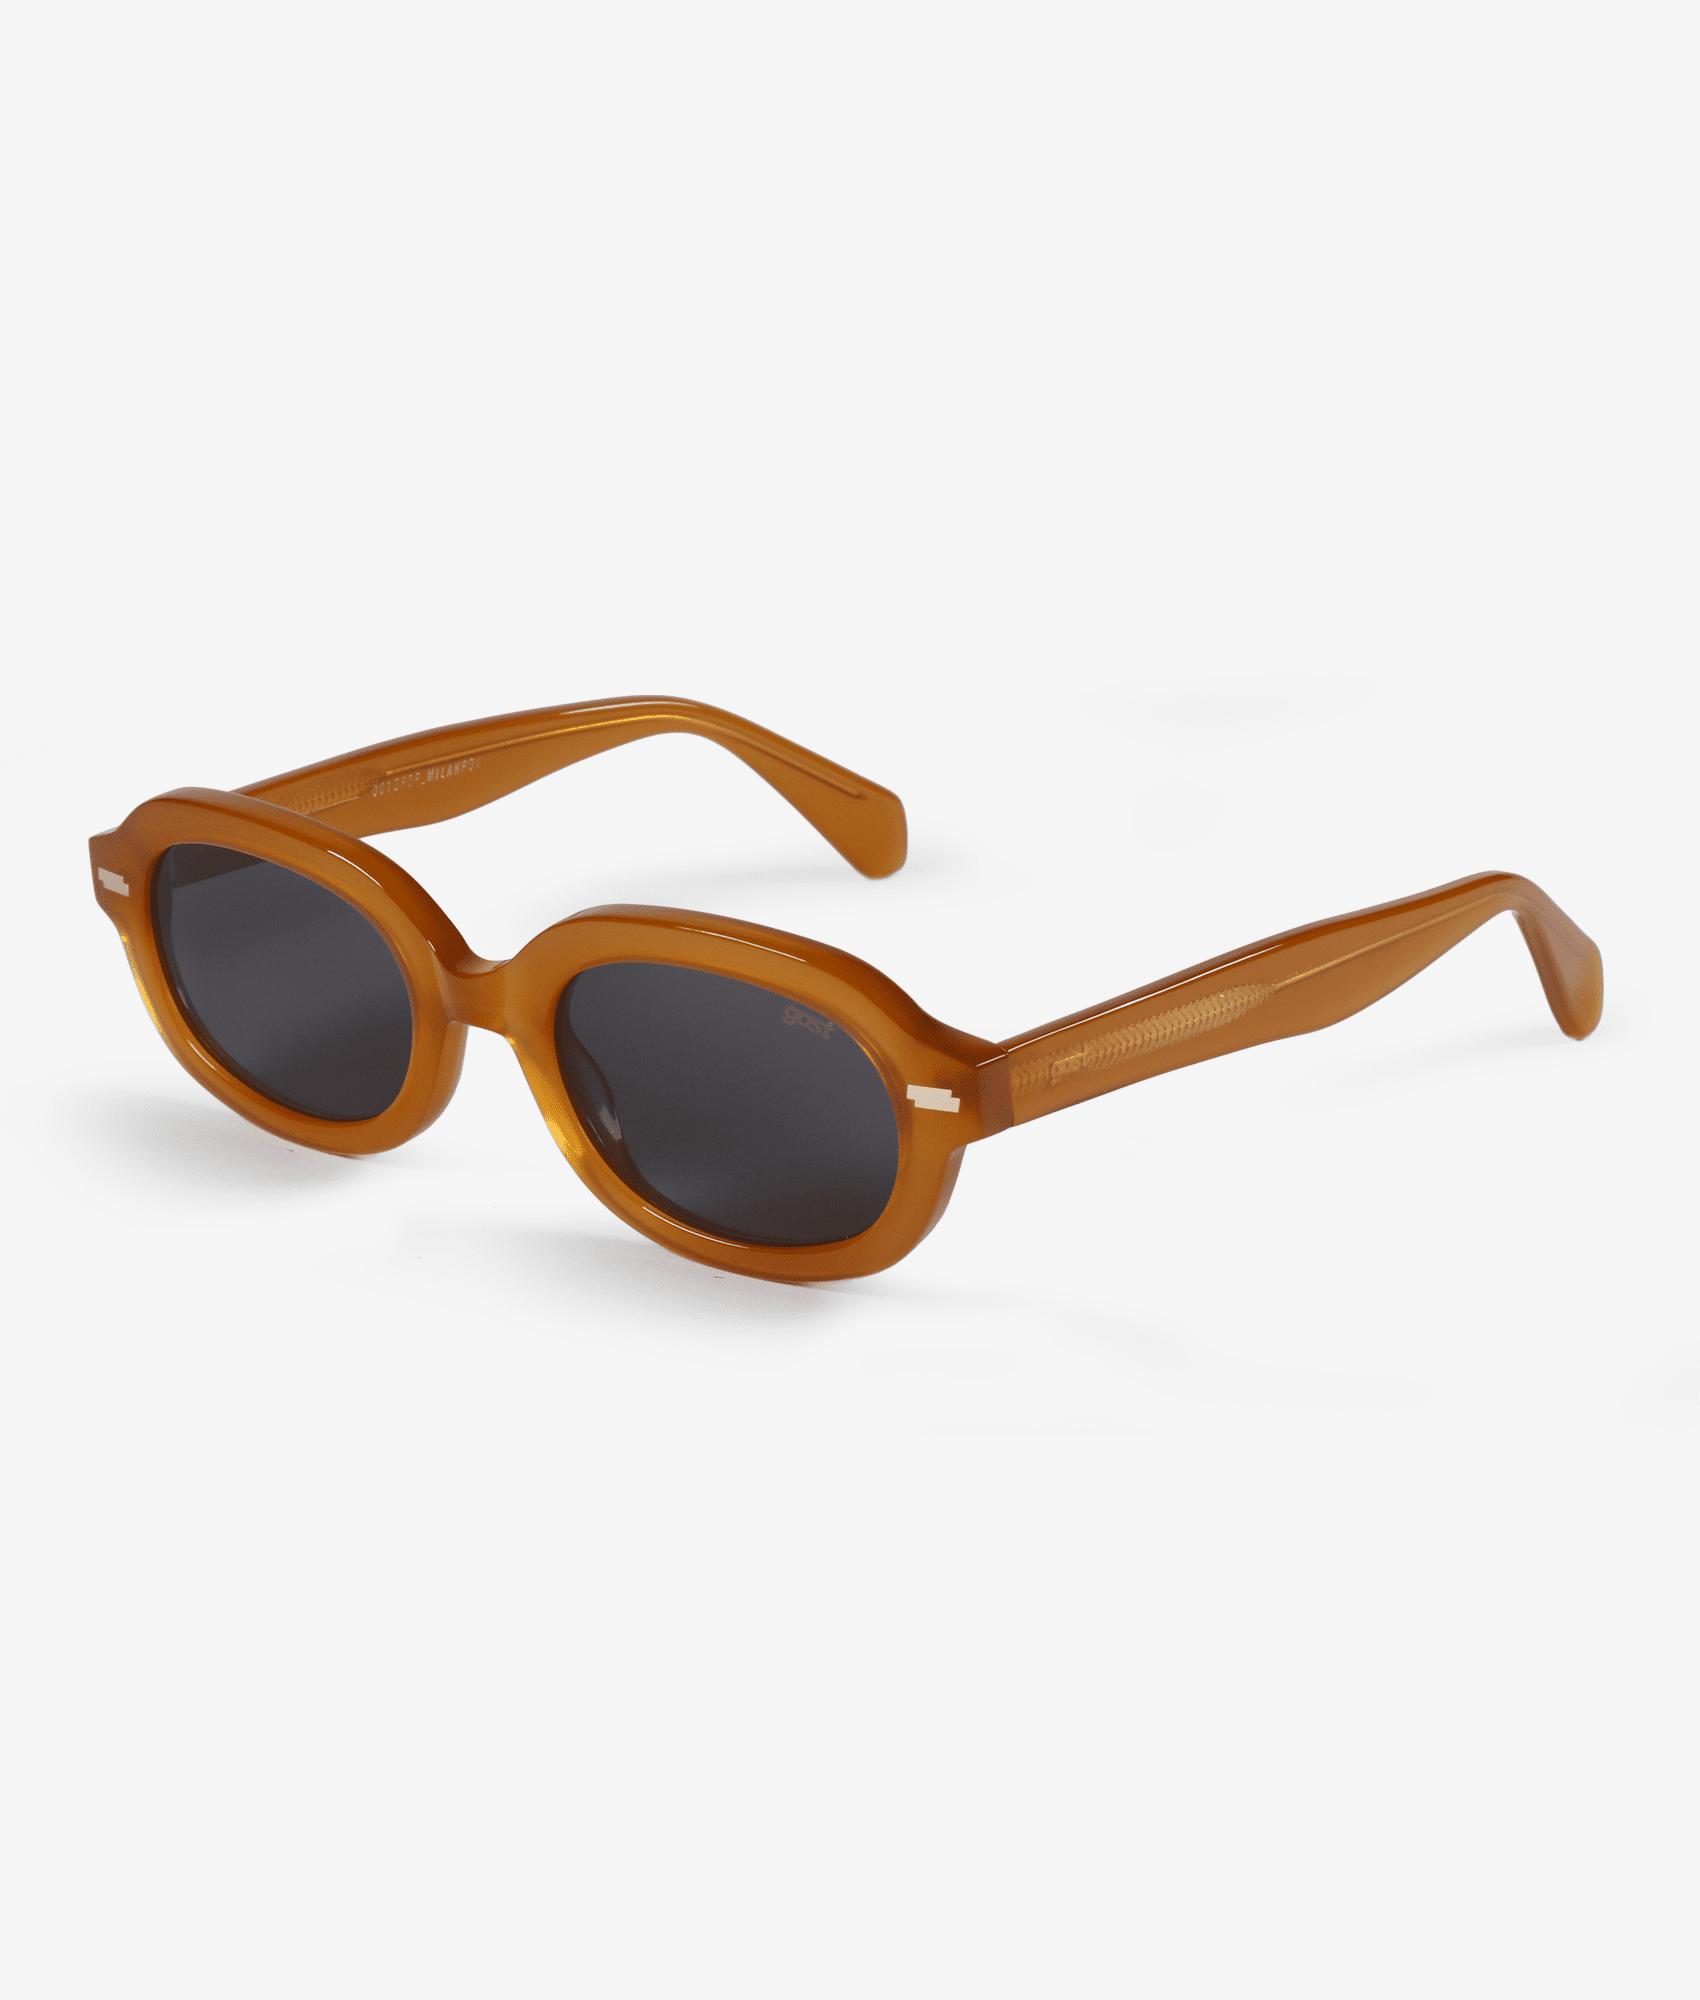 NSFK Gast Sunglasses